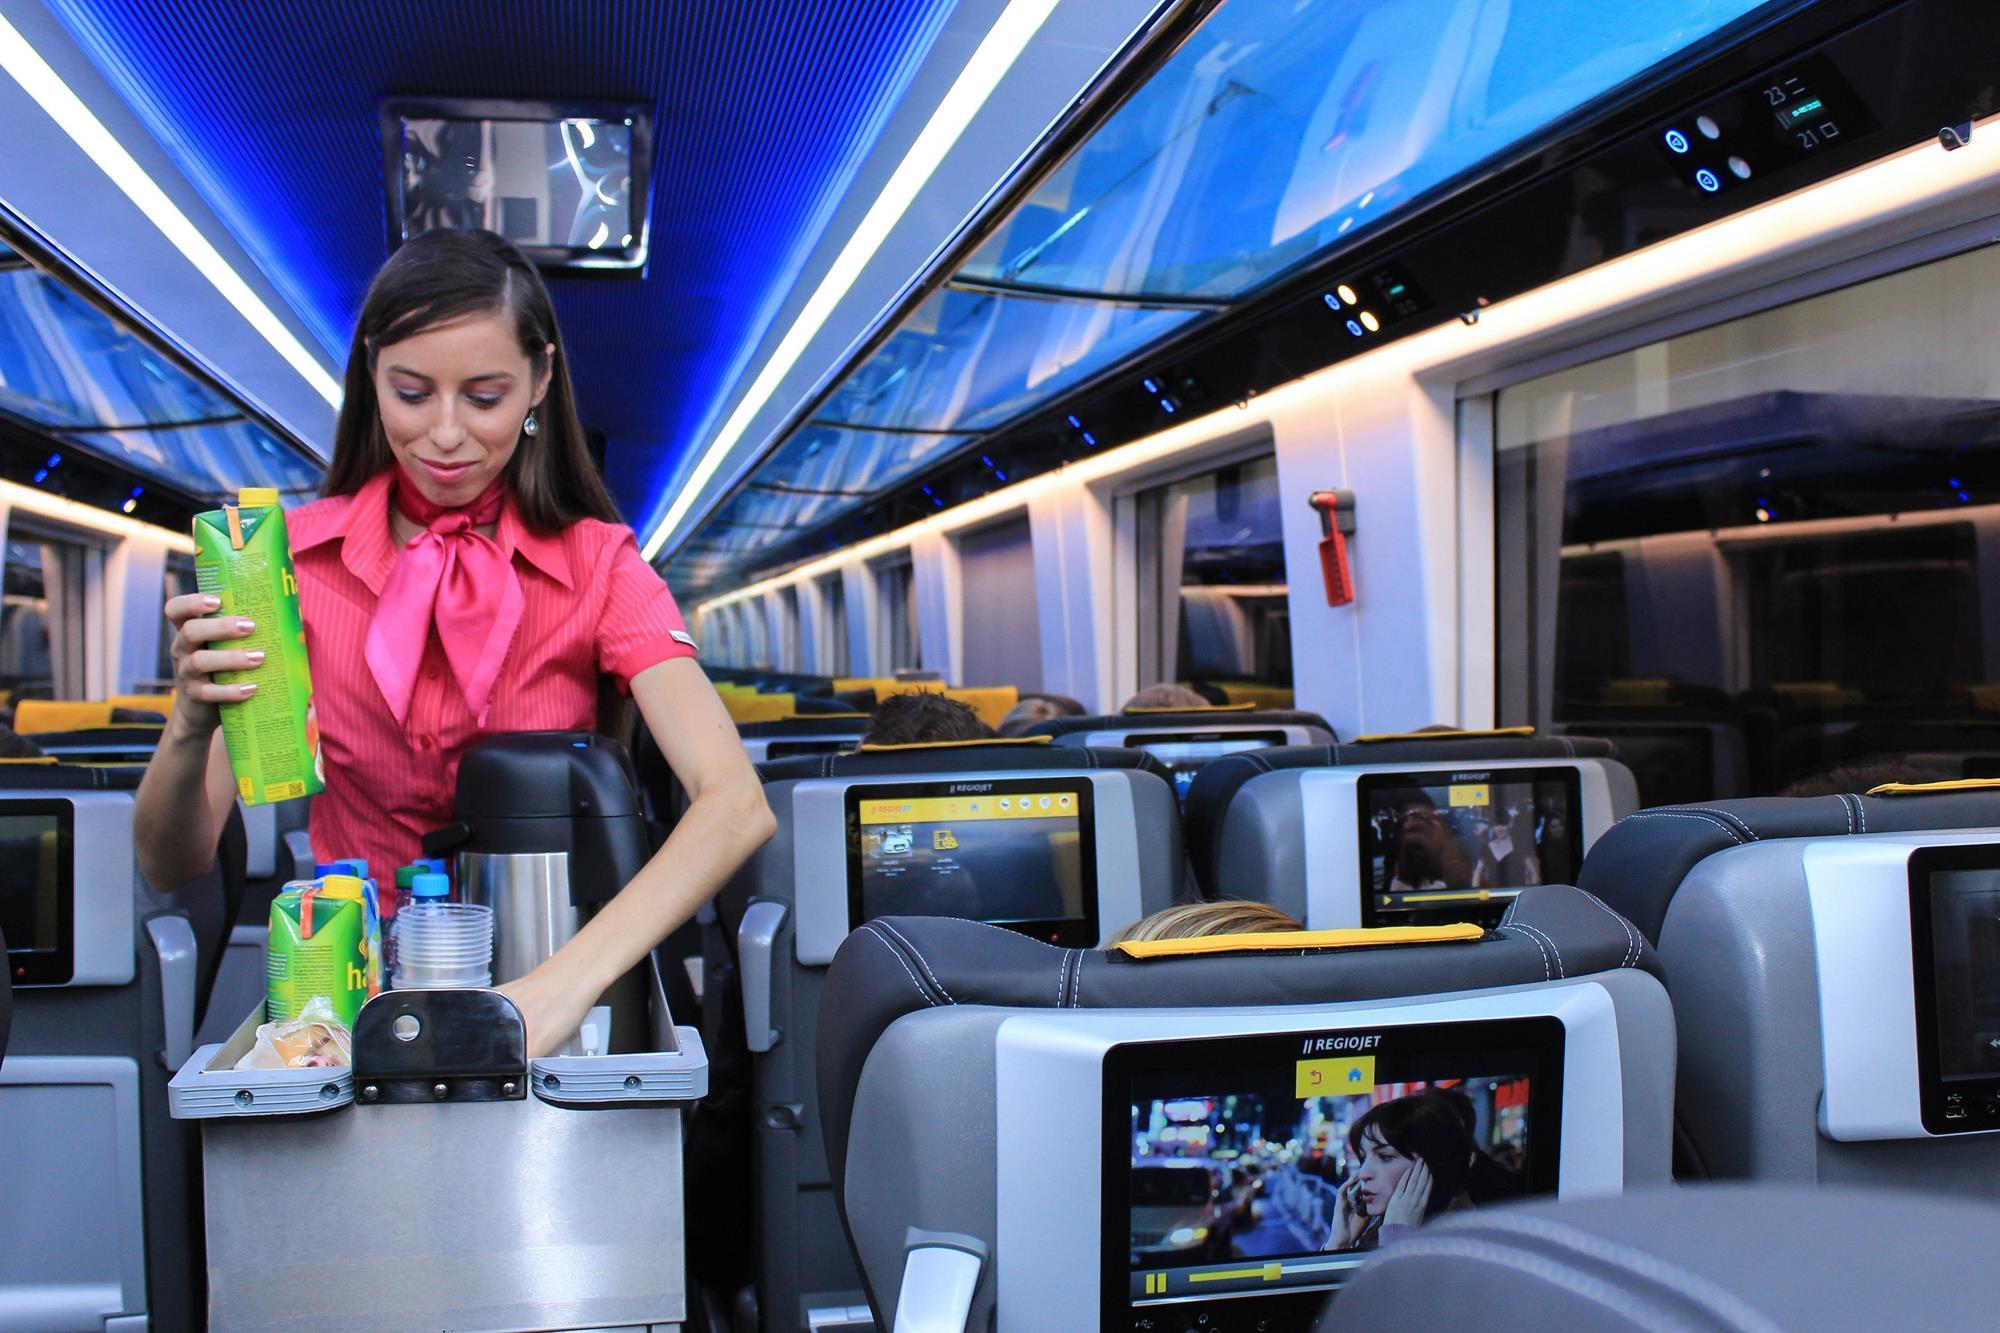 Praha – Wien – Budapest train aims to undercut 'nonsense prices' of state operators